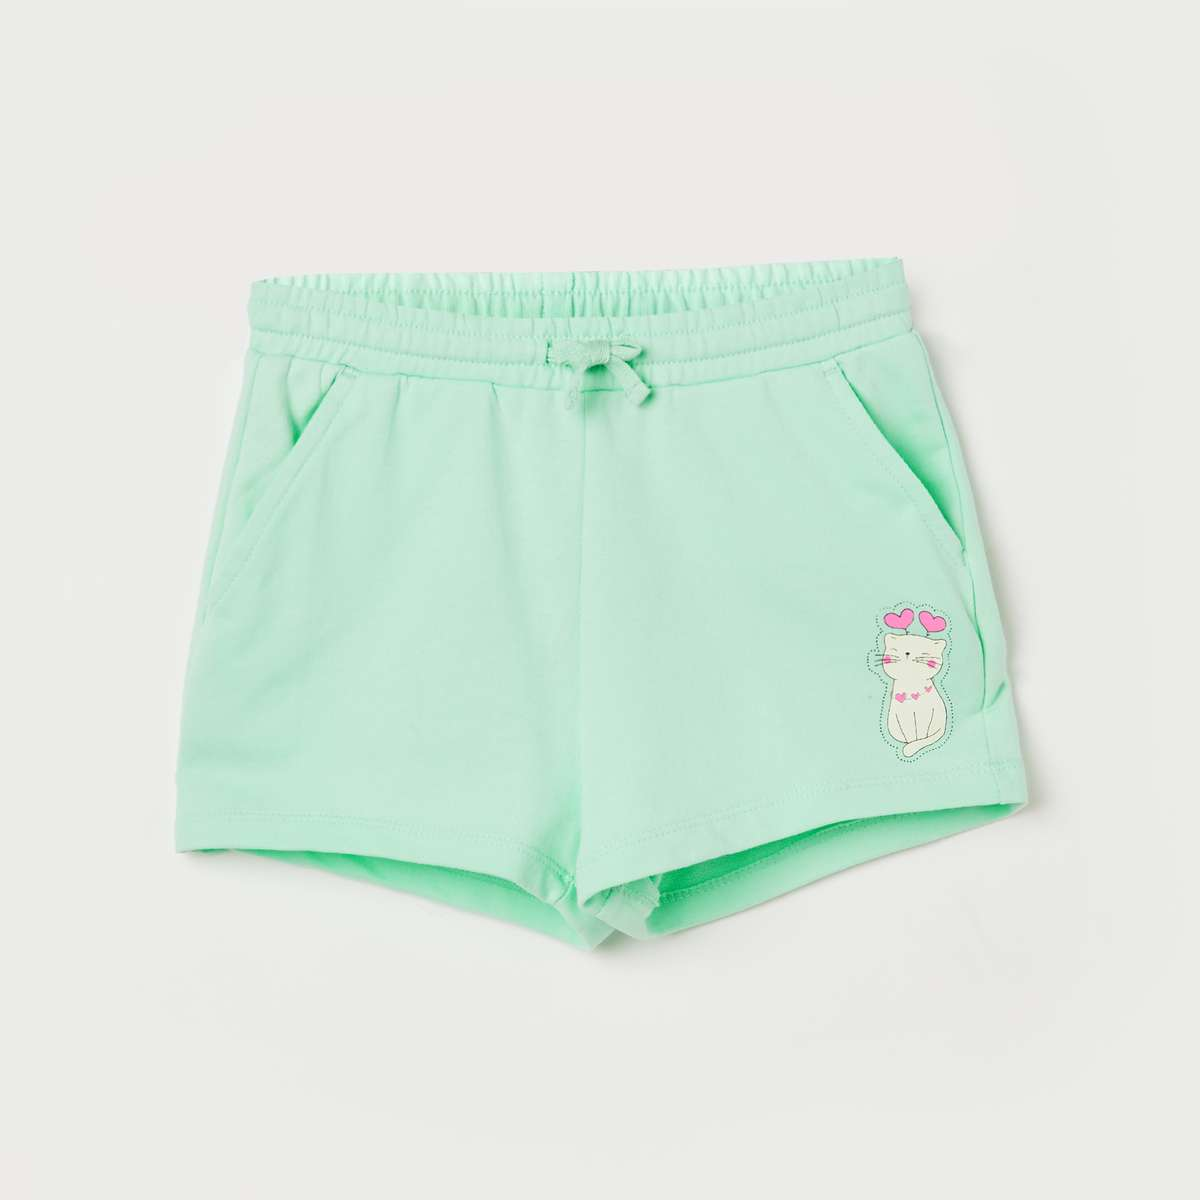 1.FAME FOREVER KIDS Girls Printed Elasticated Shorts